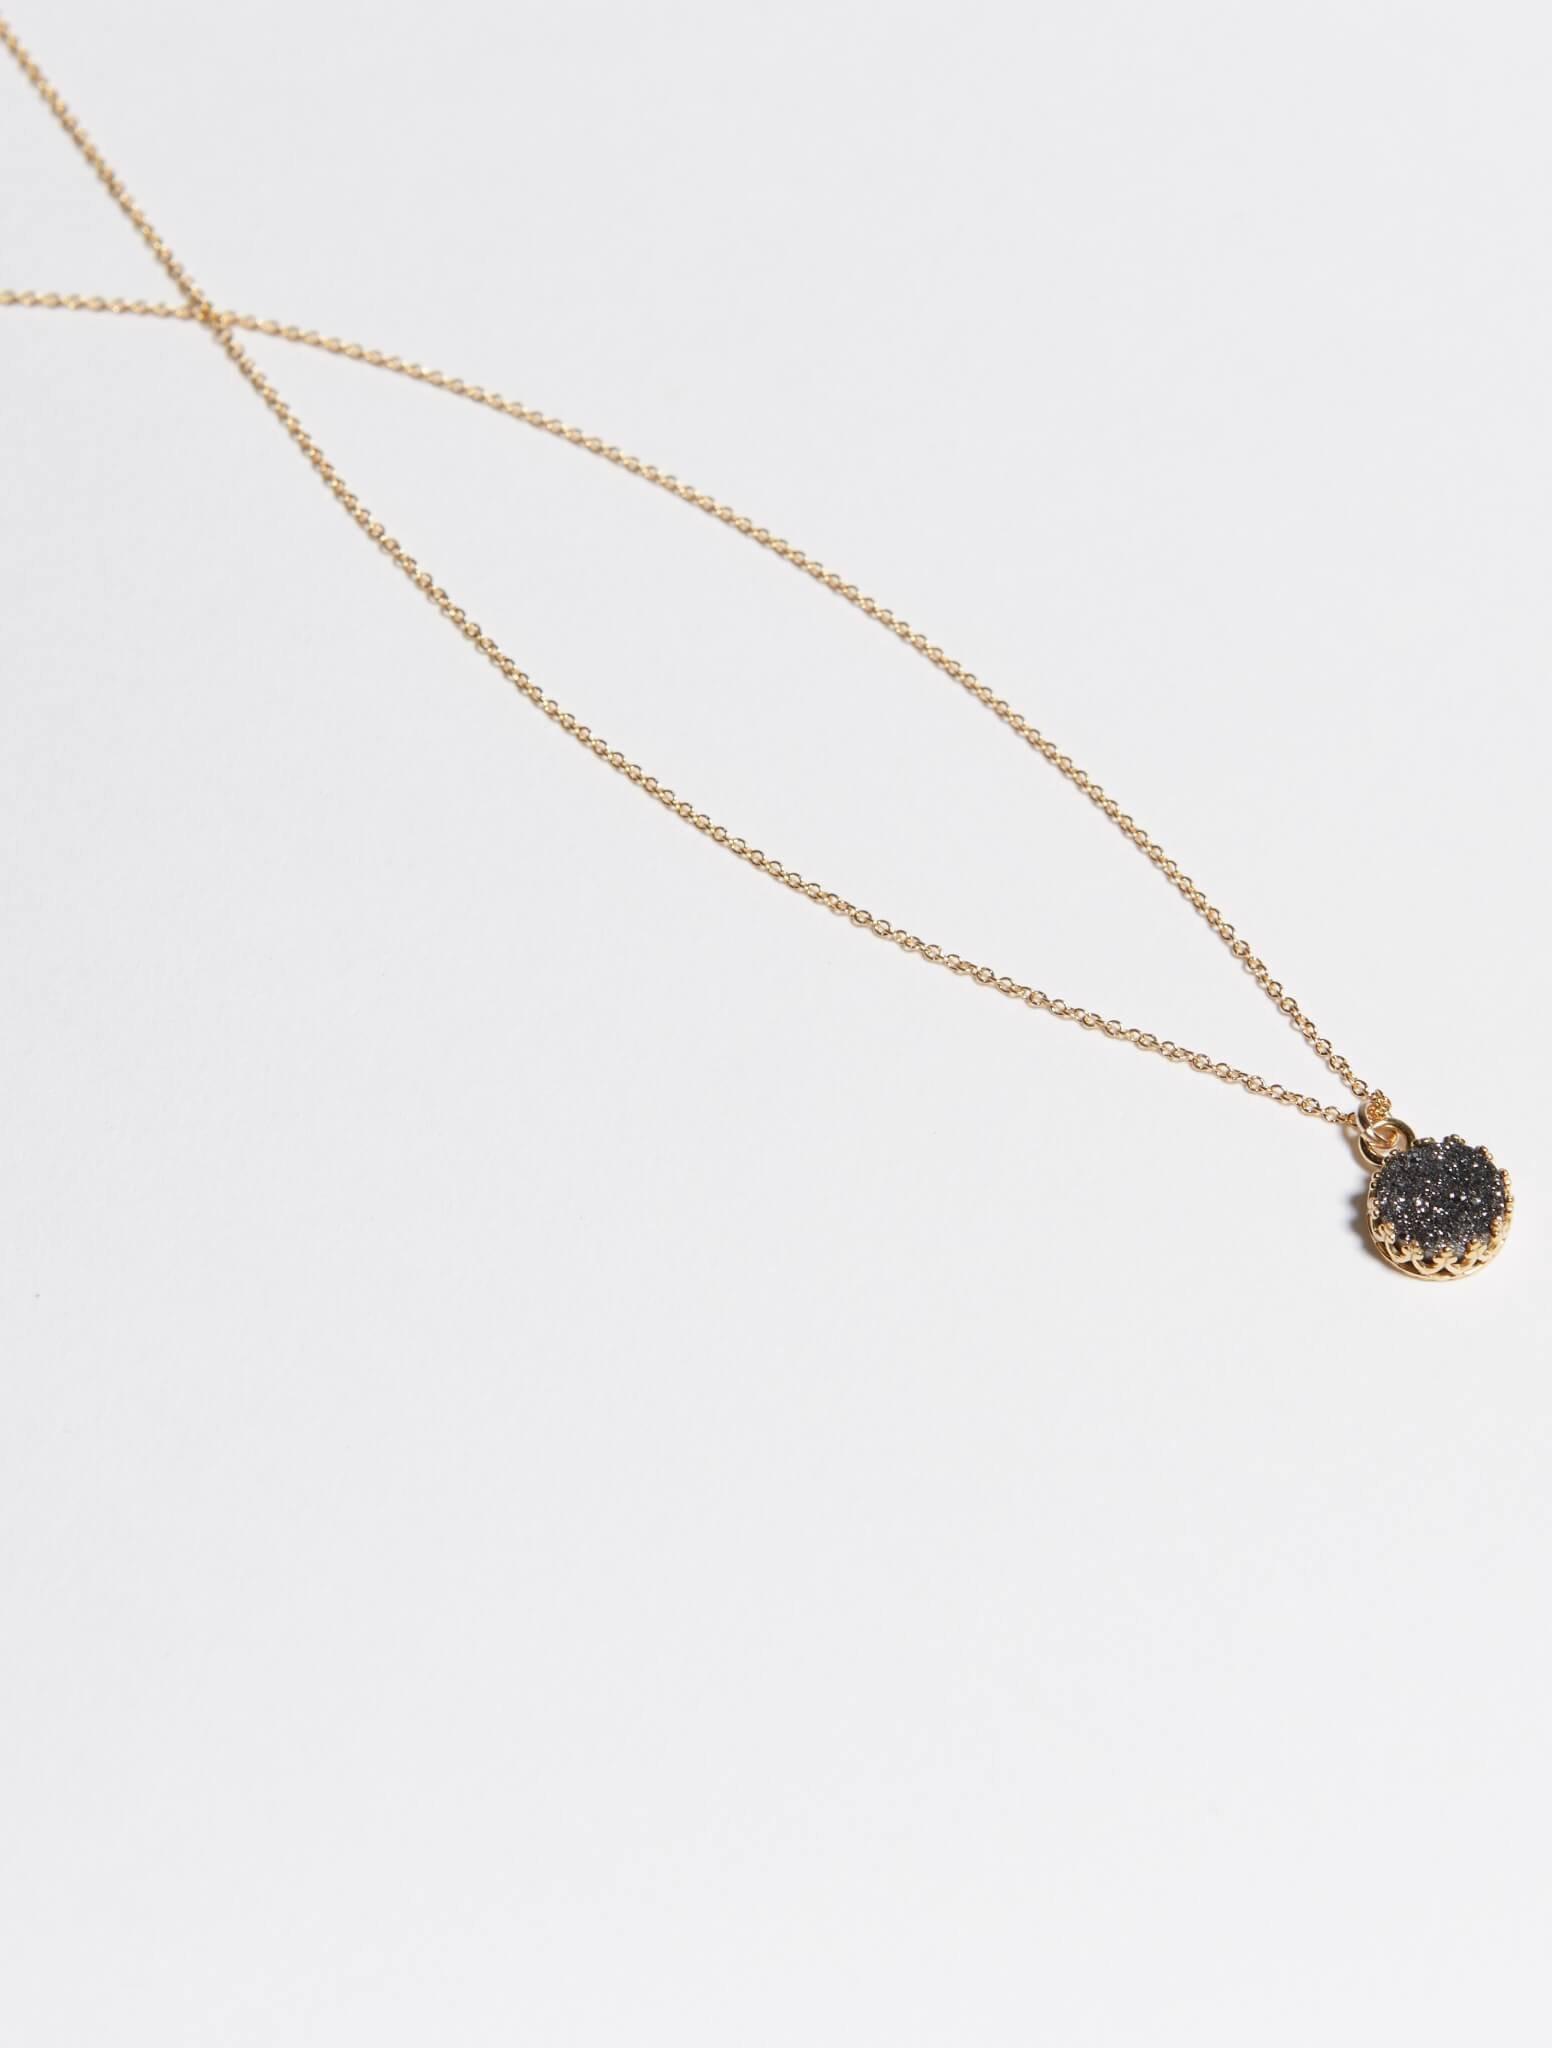 Druzy-Petite-Layering-Necklace-black2-copy_2048x2048.jpeg